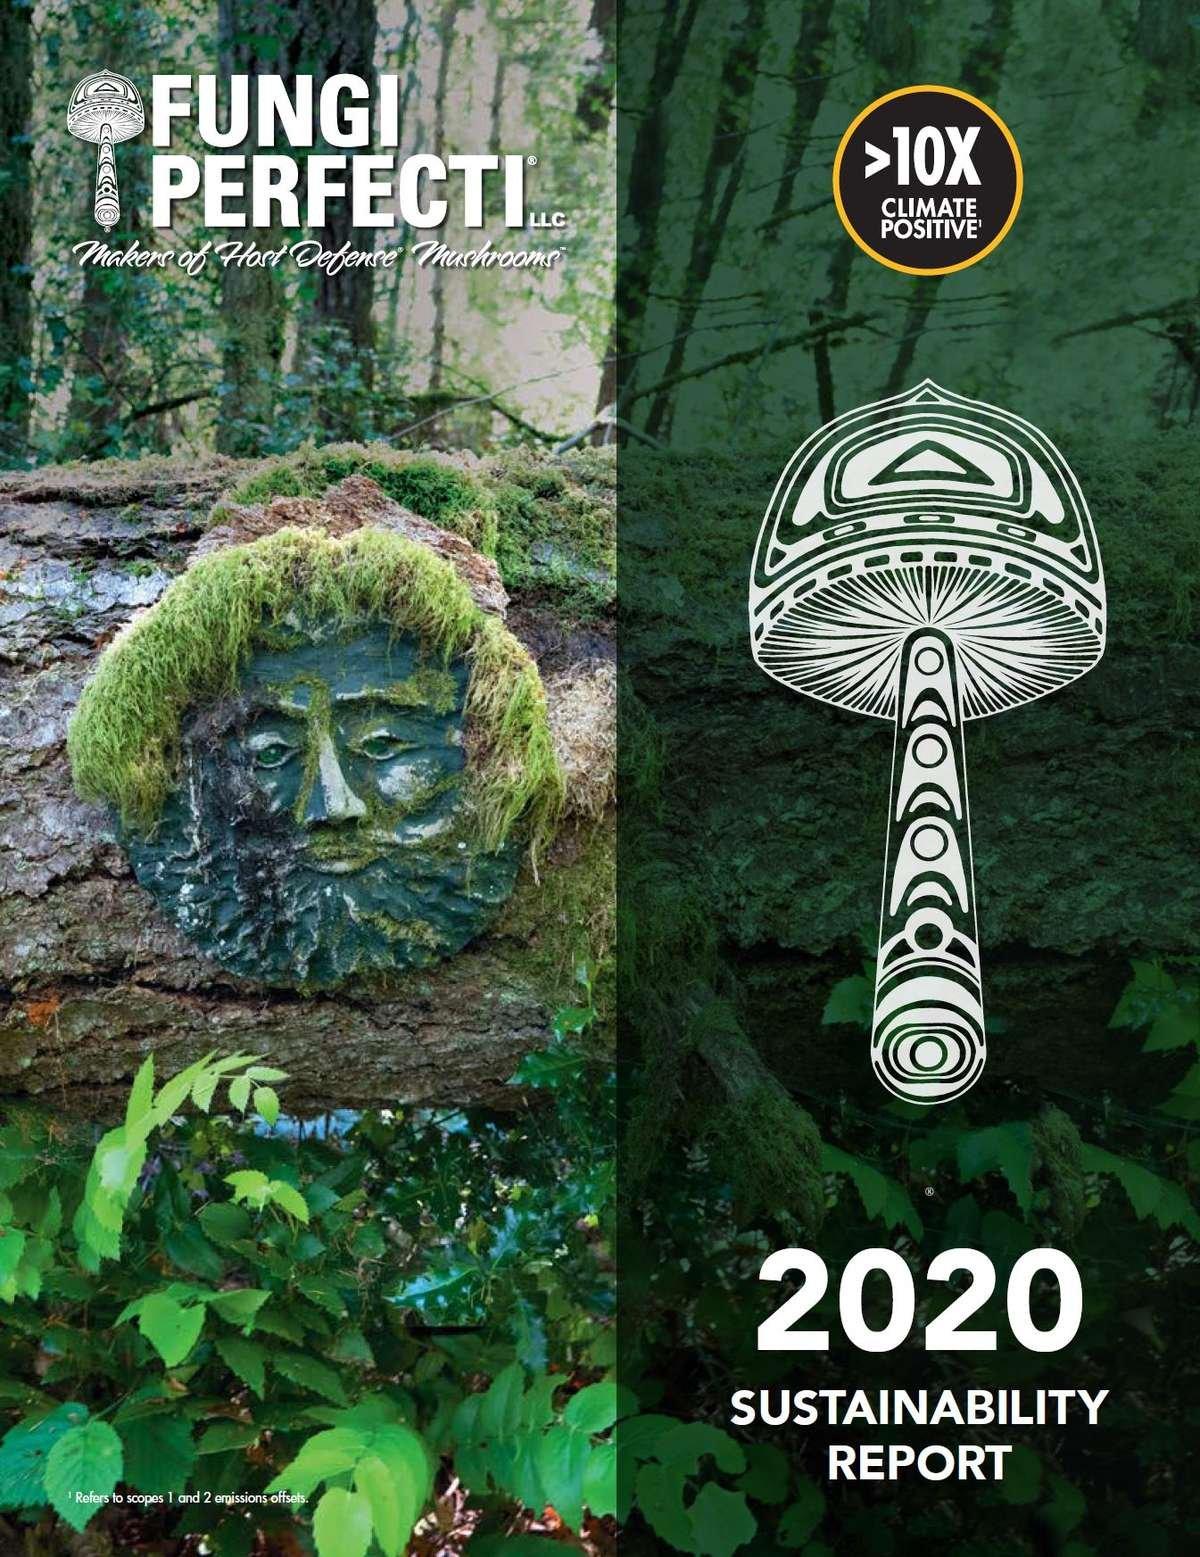 Download the Fungi Perfecti 2019 Sustainability Report